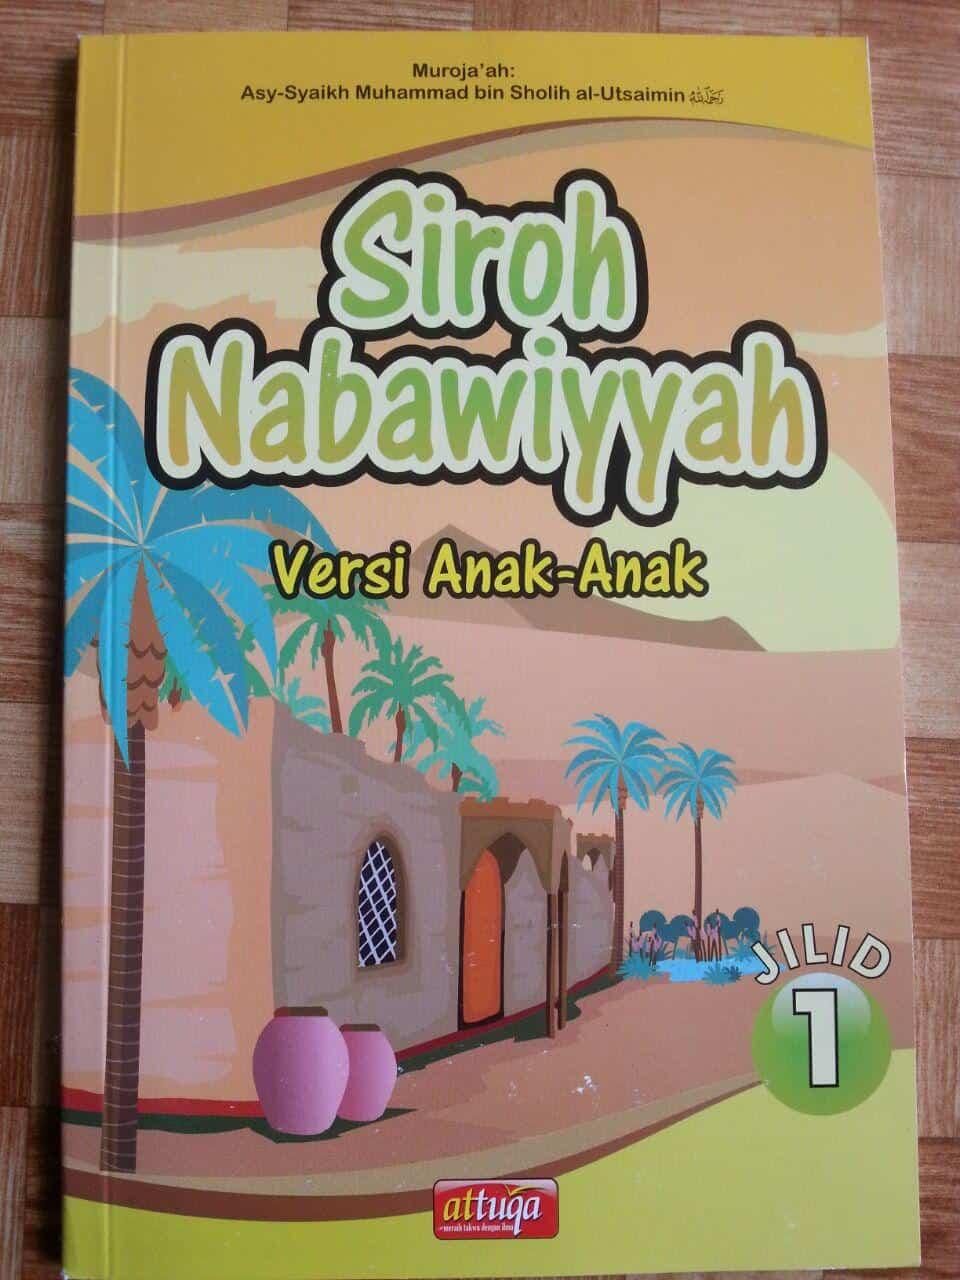 Buku Siroh Nabawiyah Versi Anak-Anak Jilid 1 cover 2